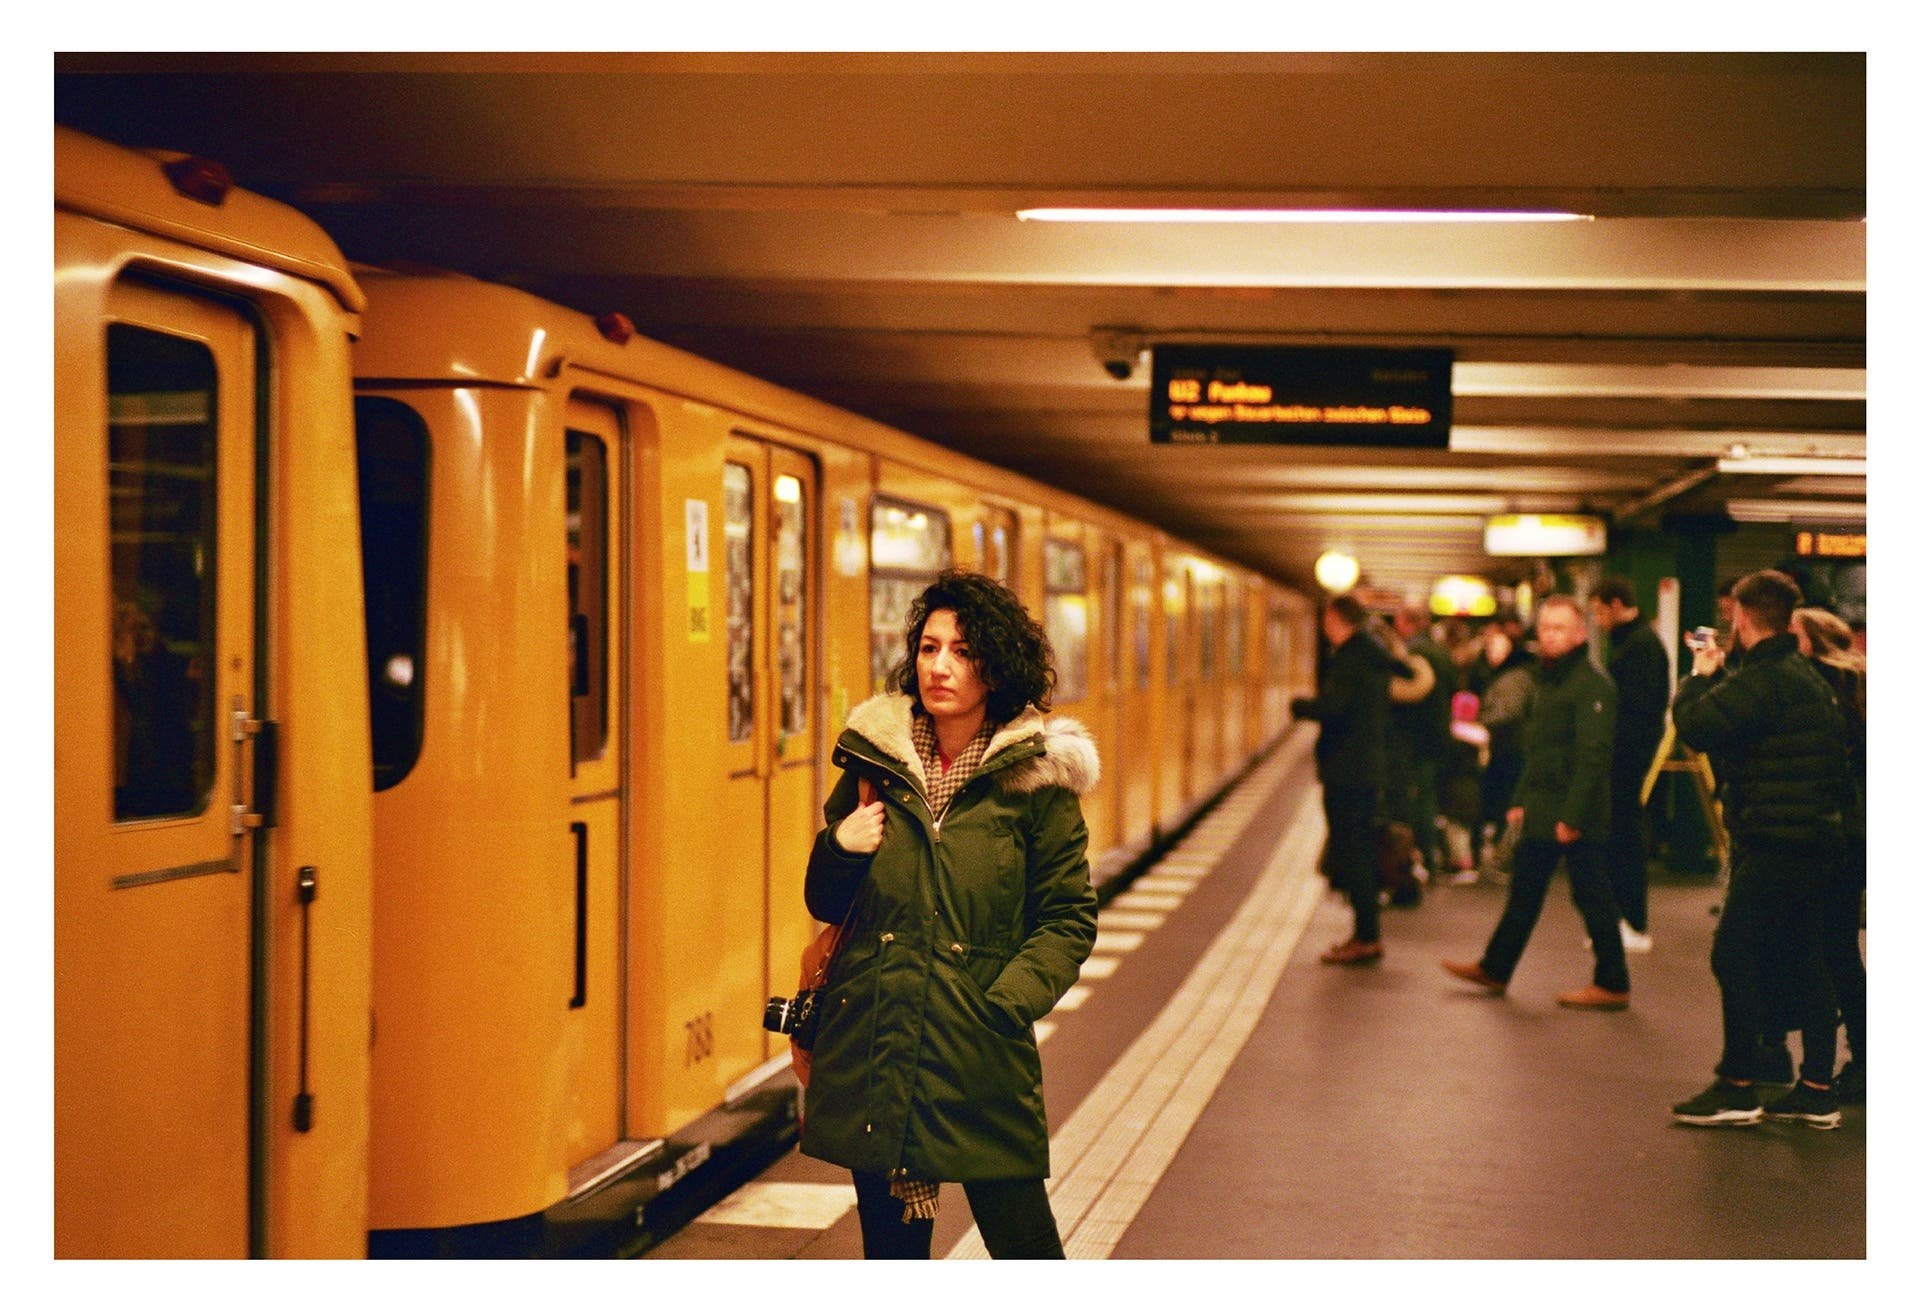 Onur Kurt Chronicles Berlin in Gorgeous CineStill 800T Snaps